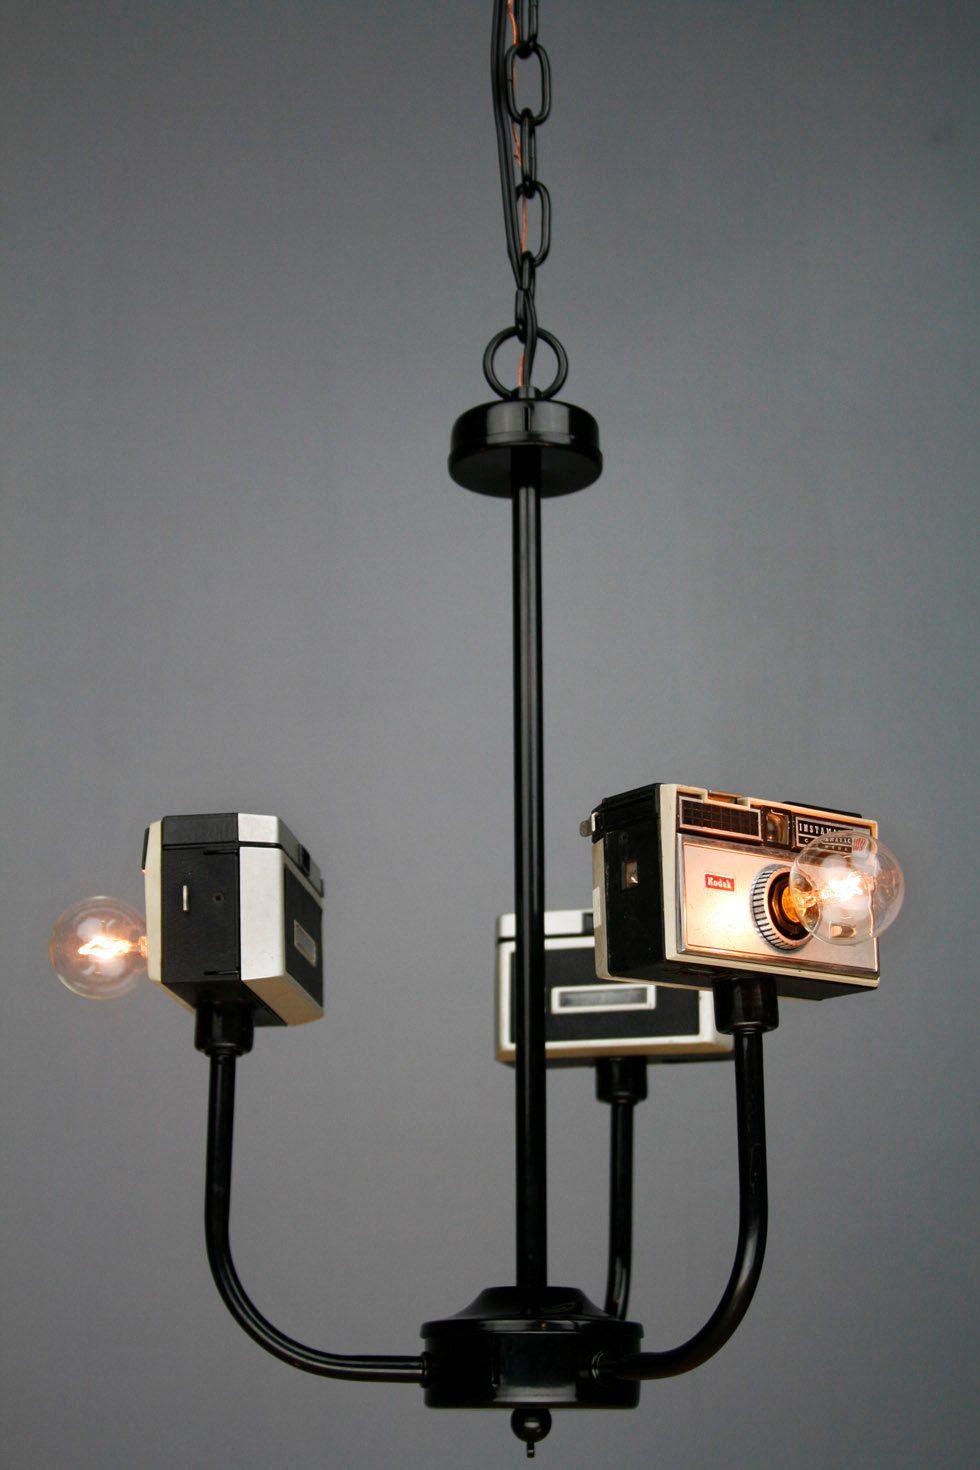 Handmade vintage upcycled camera lamp chandelier 40000 via etsy handmade vintage upcycled camera lamp chandelier 40000 via etsy kristy lumsden lumsden arubaitofo Choice Image